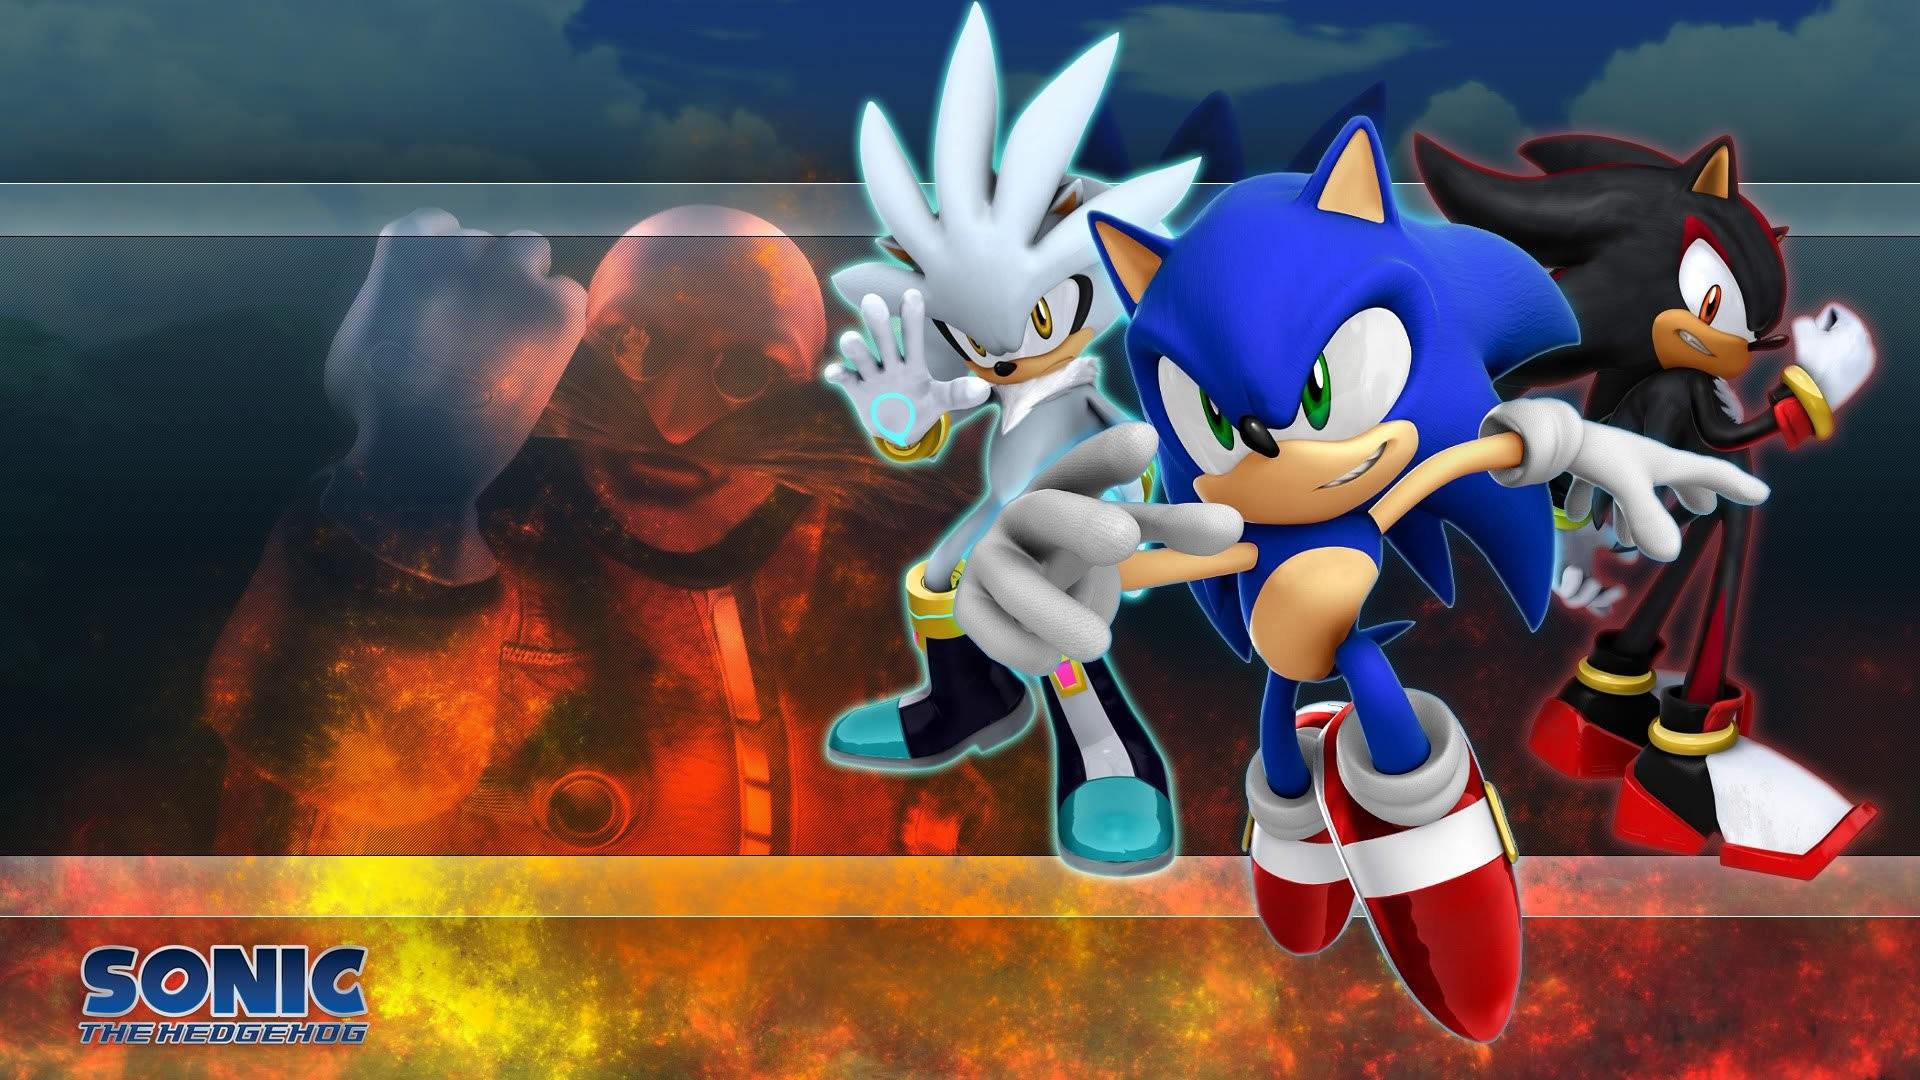 Sonic The Hedgehog 219176 …